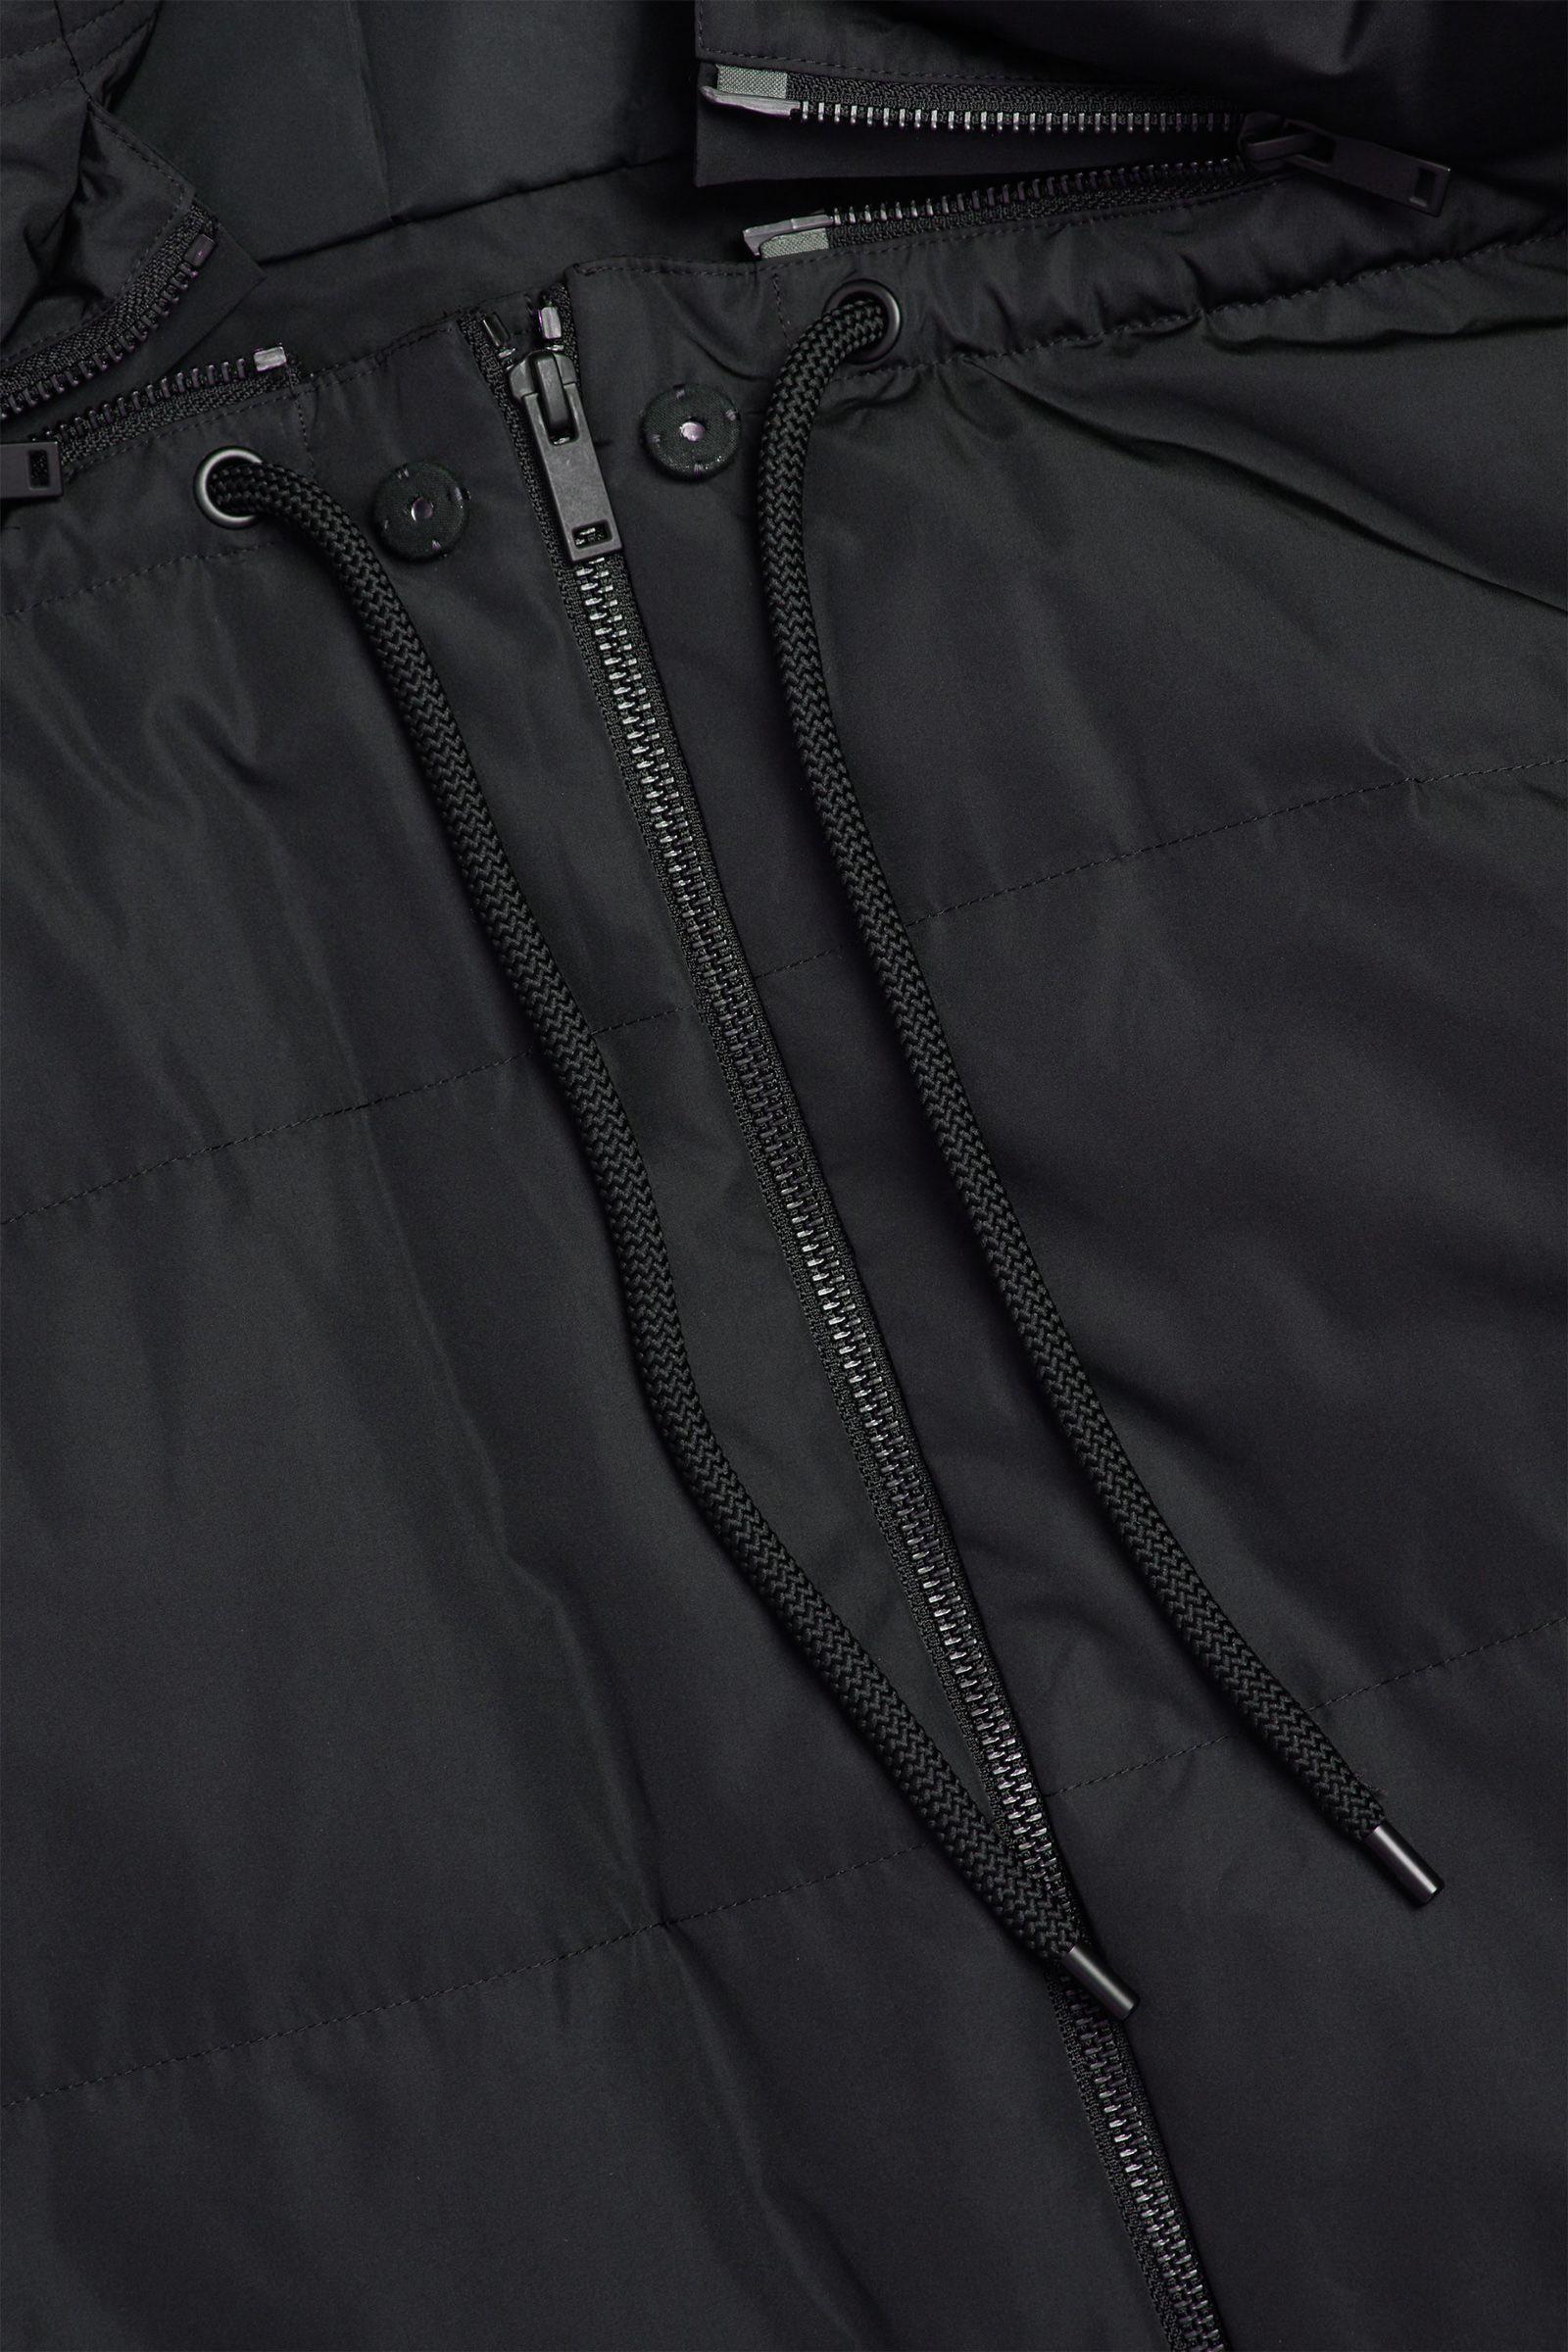 COS 3 in 1 하이브리드 푸퍼 재킷의 블랙컬러 Detail입니다.